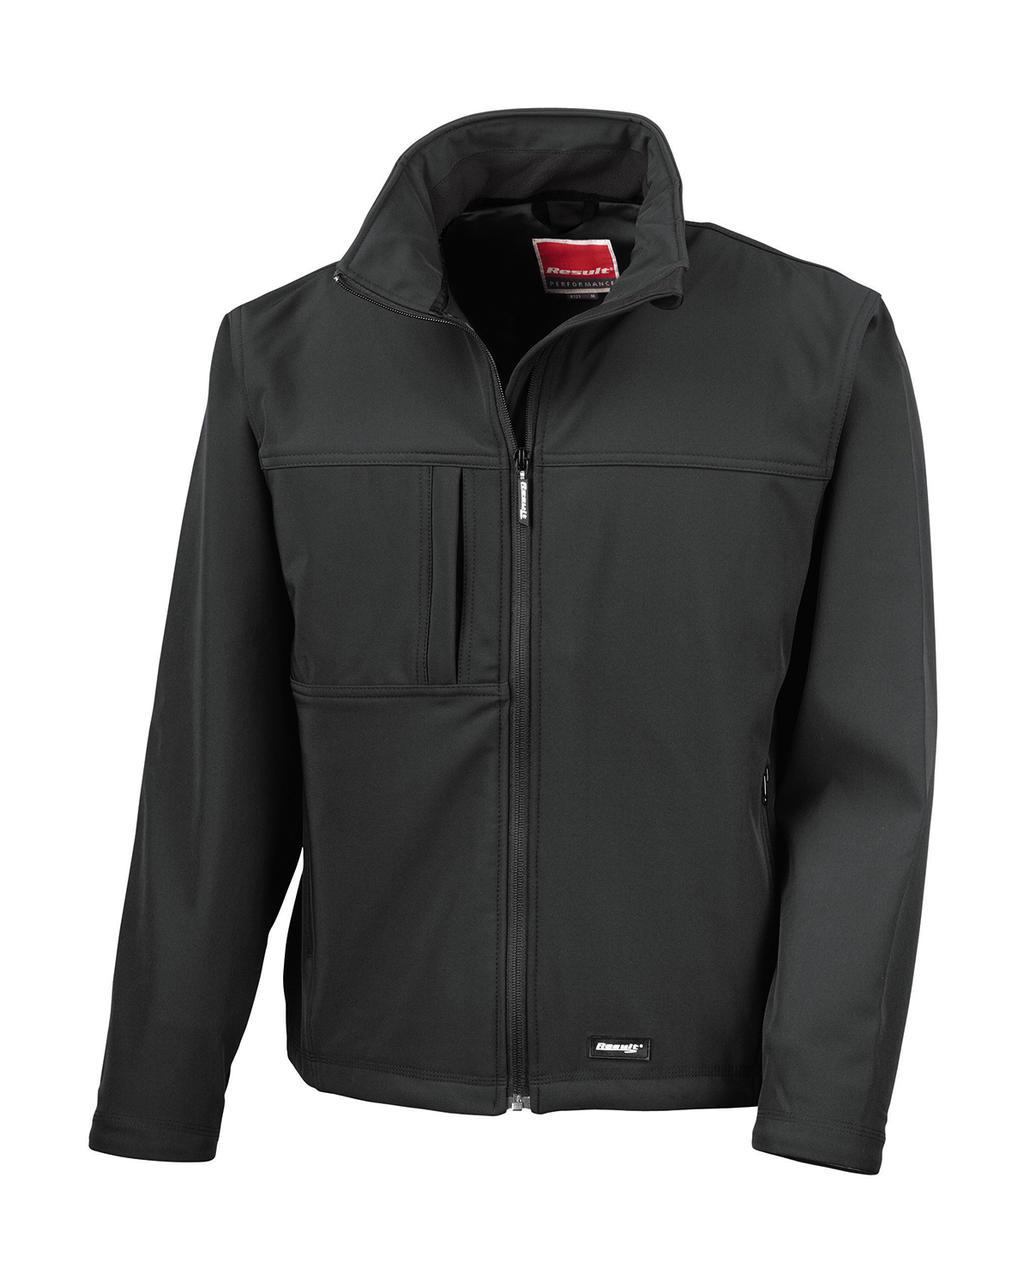 Classic Softshelll Jacket